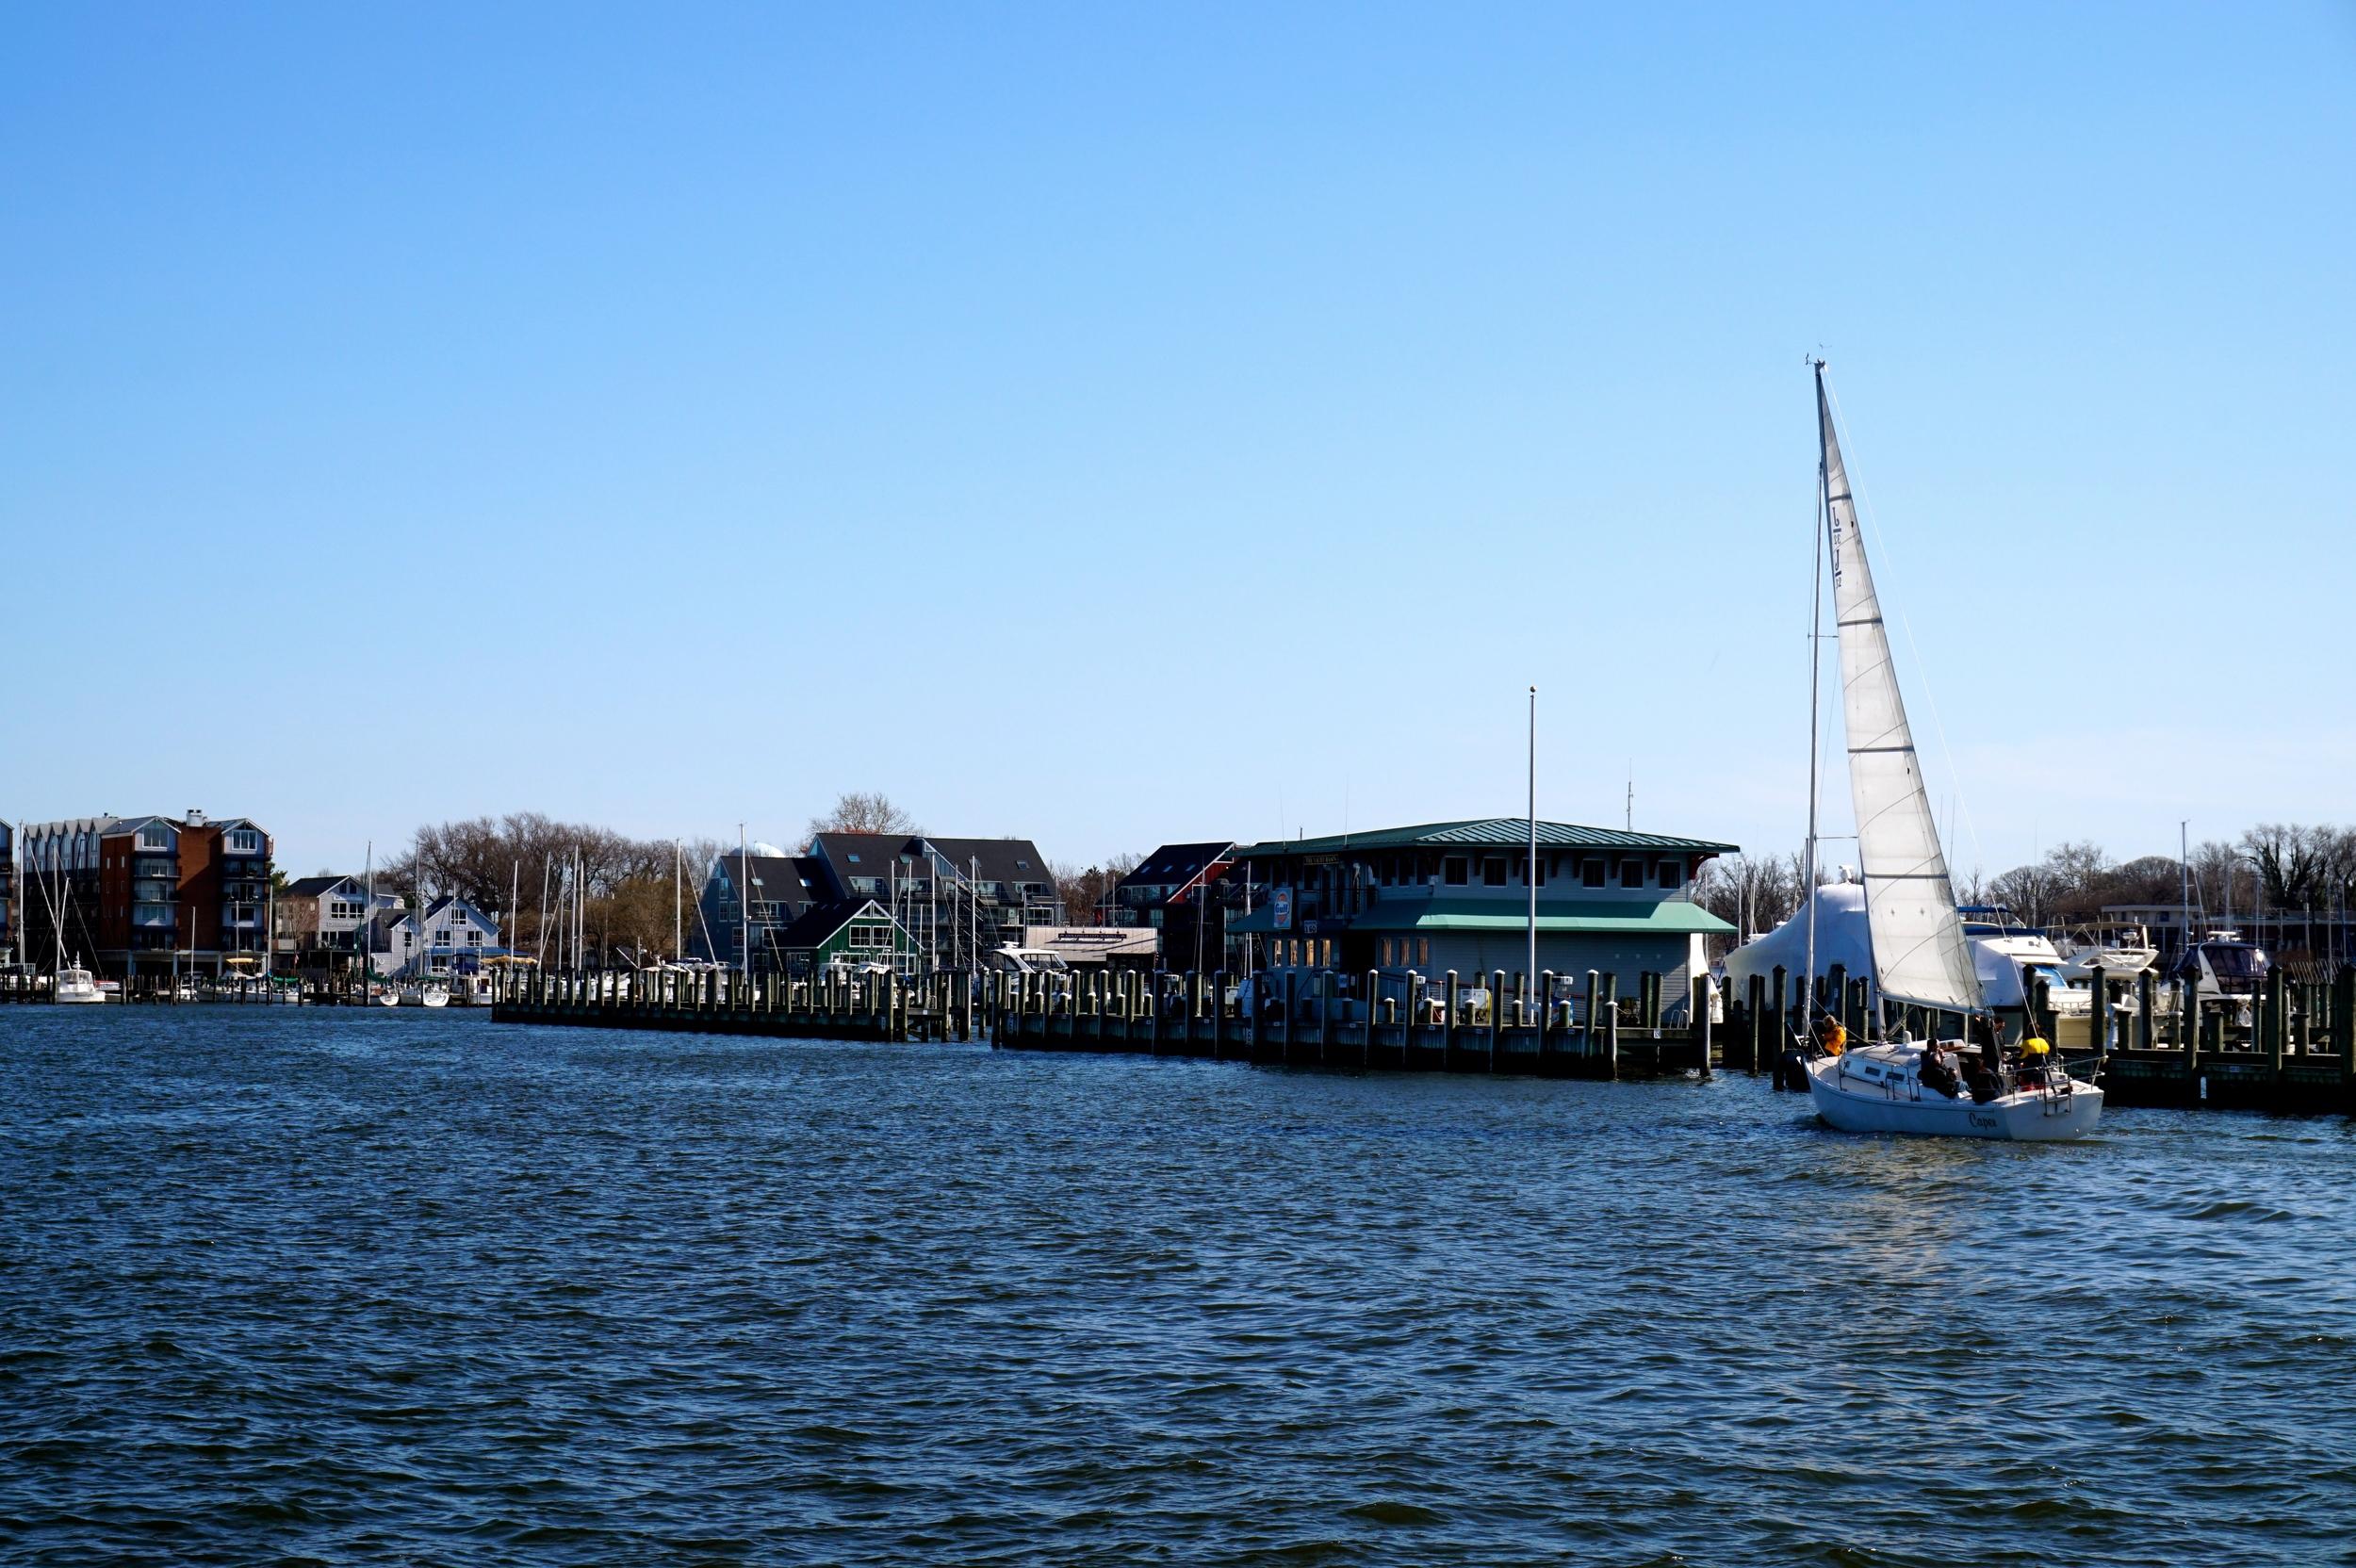 annapolisboats.jpg